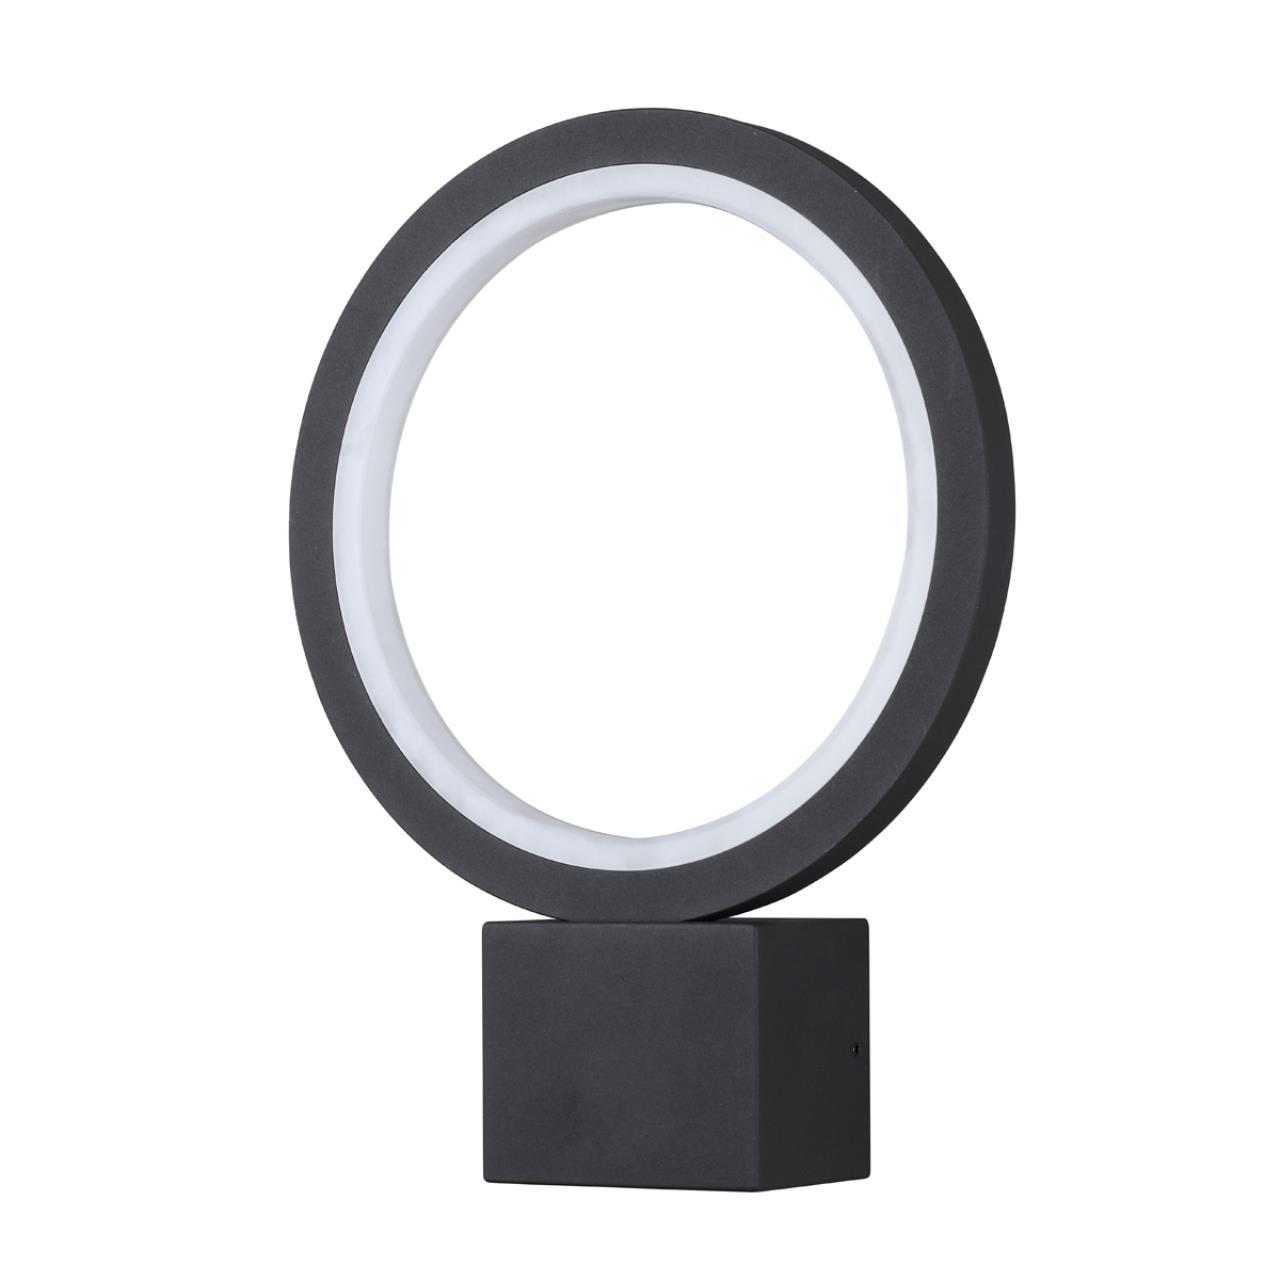 357444 STREET NT18 151 темно-серый Ландшафтный светильник IP65 LED 3000K 10W 100-240V ROCA